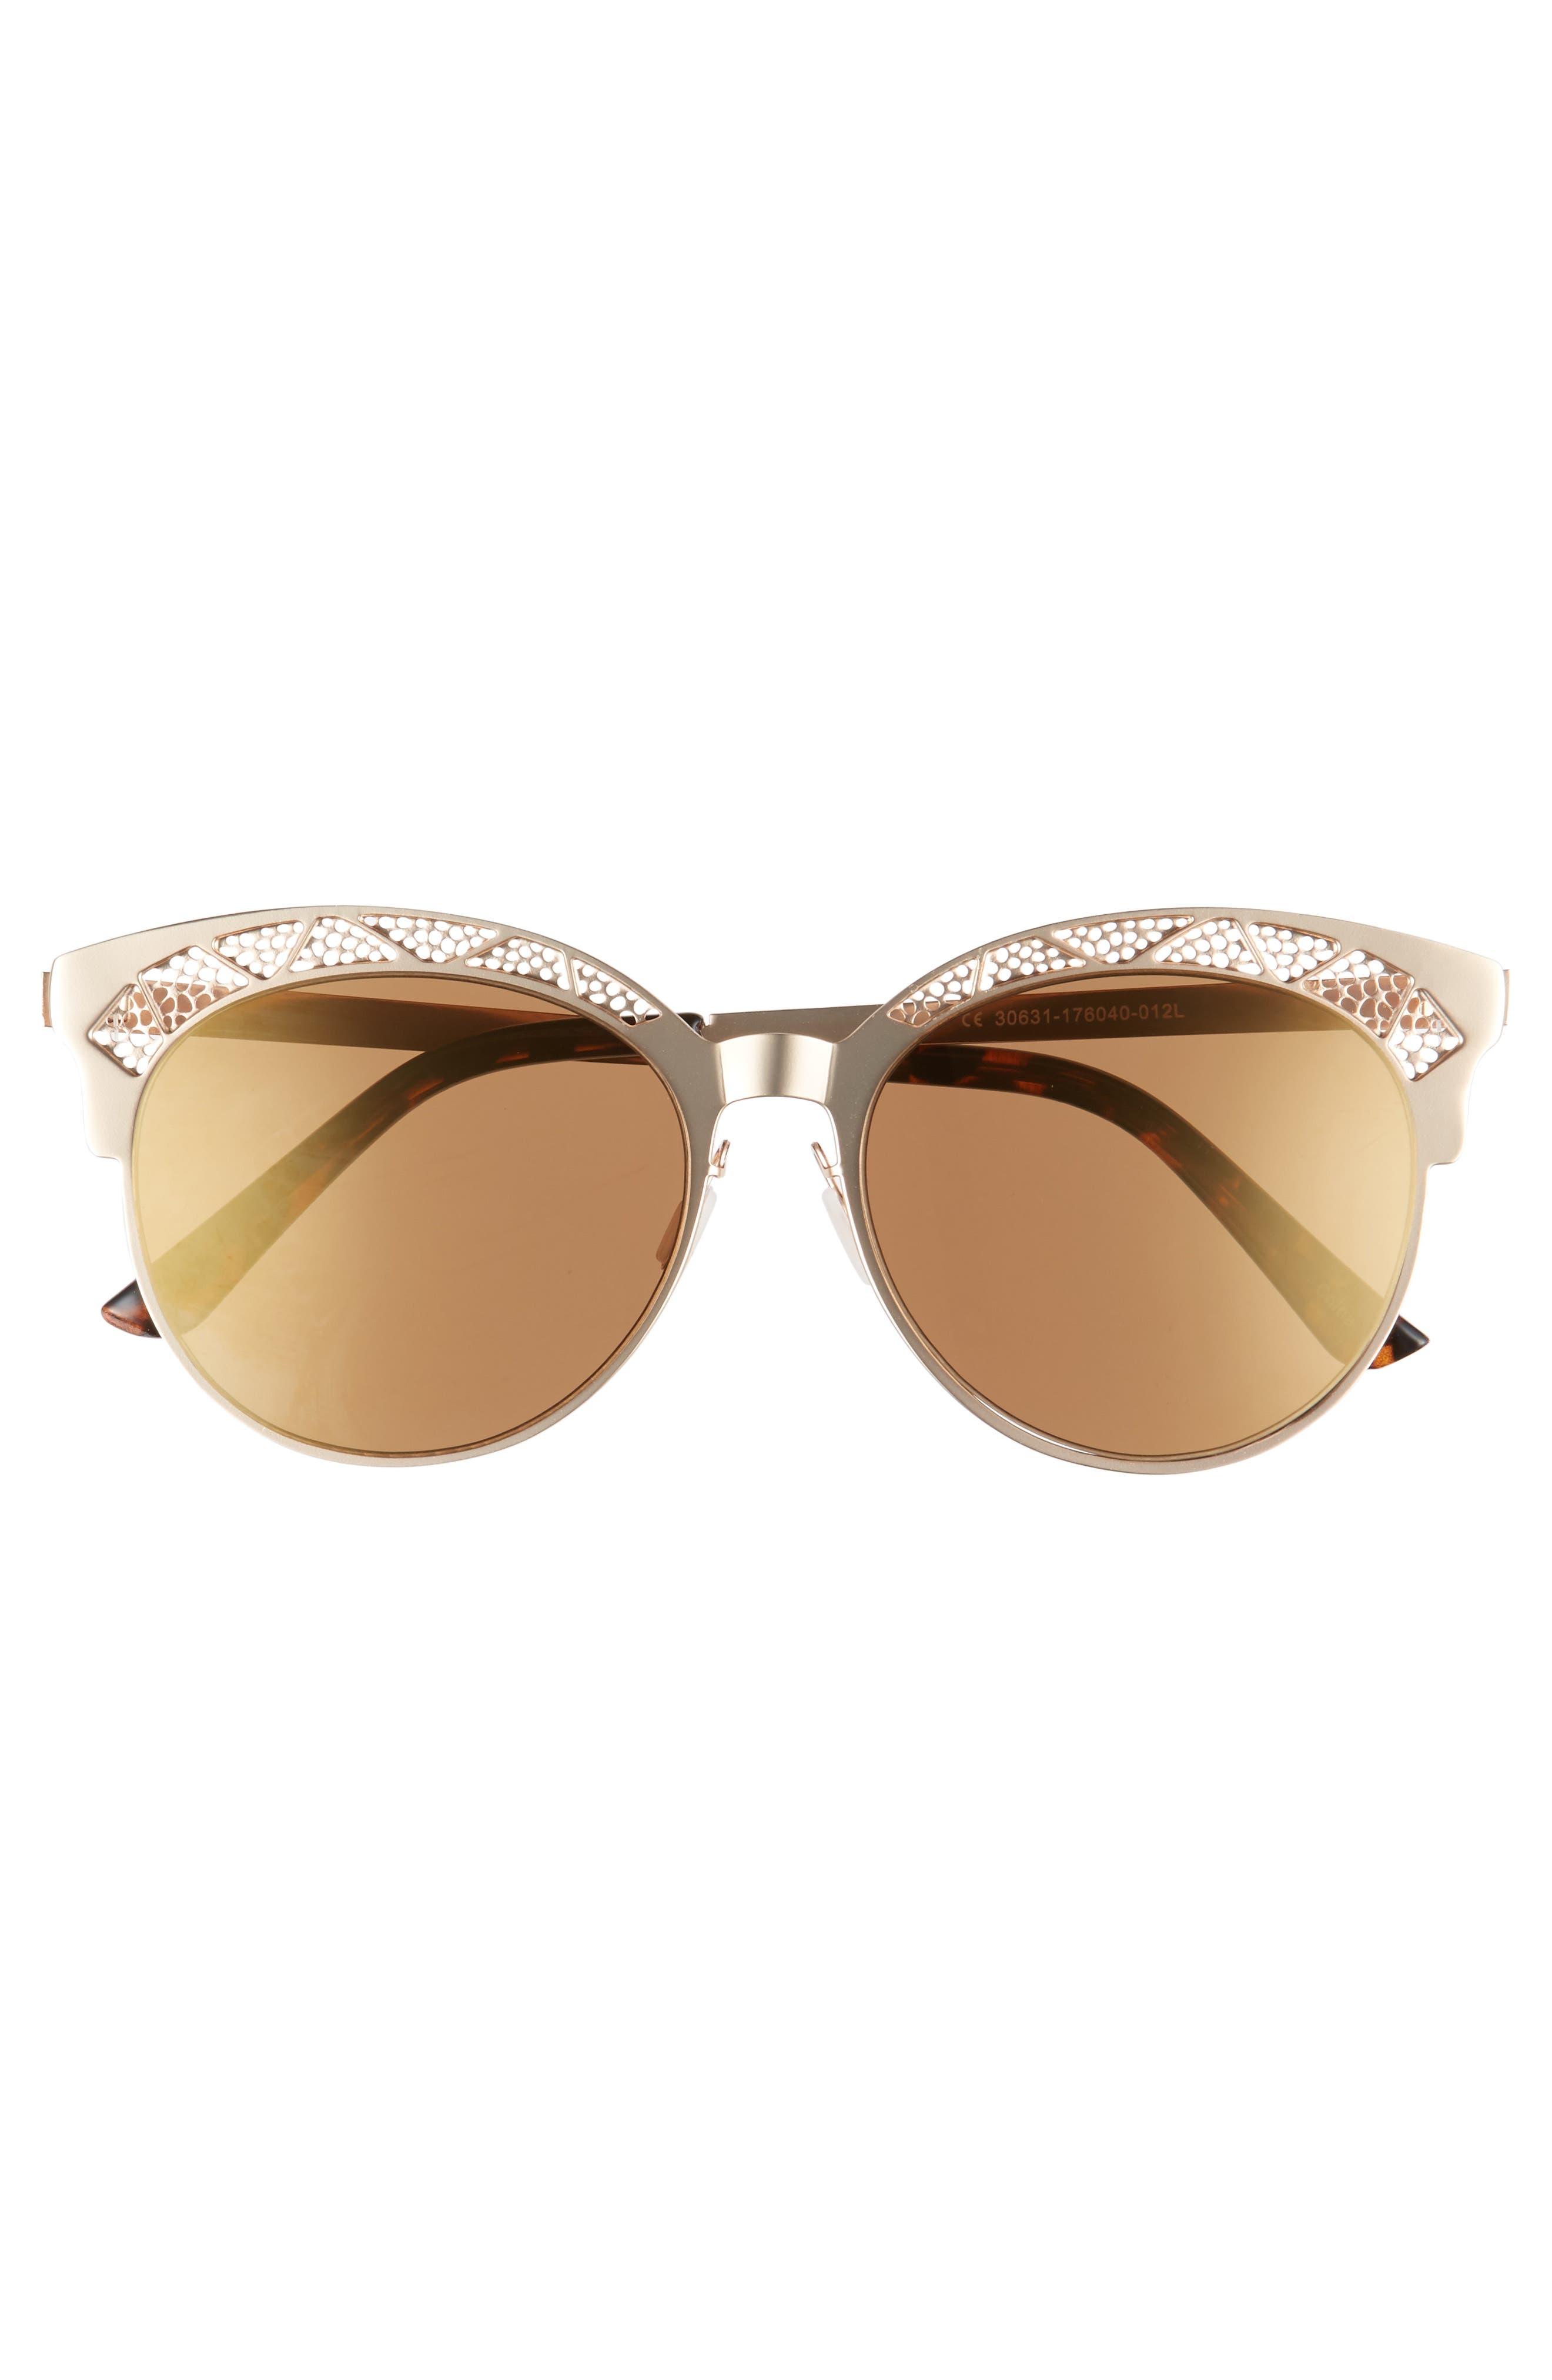 56mm Round Sunglasses,                             Alternate thumbnail 3, color,                             710